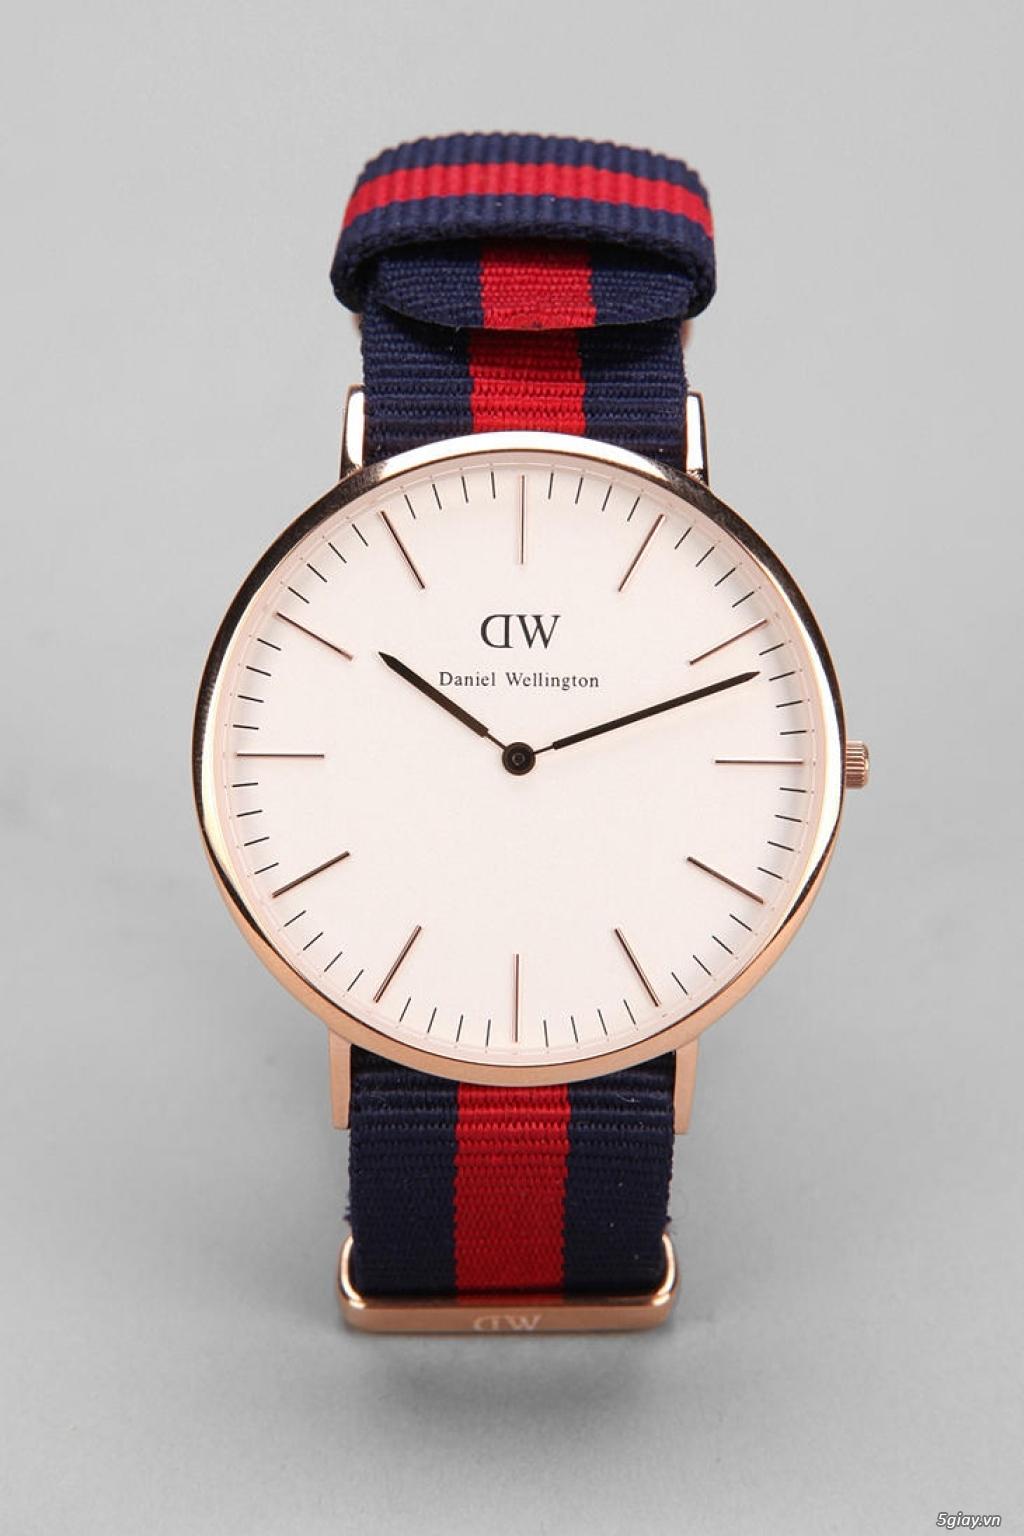 <Authentic> Đồng hồ mới 100% ship US: Movado, Seiko, Daniel Wellington, Victorinox...giá tốt - 24